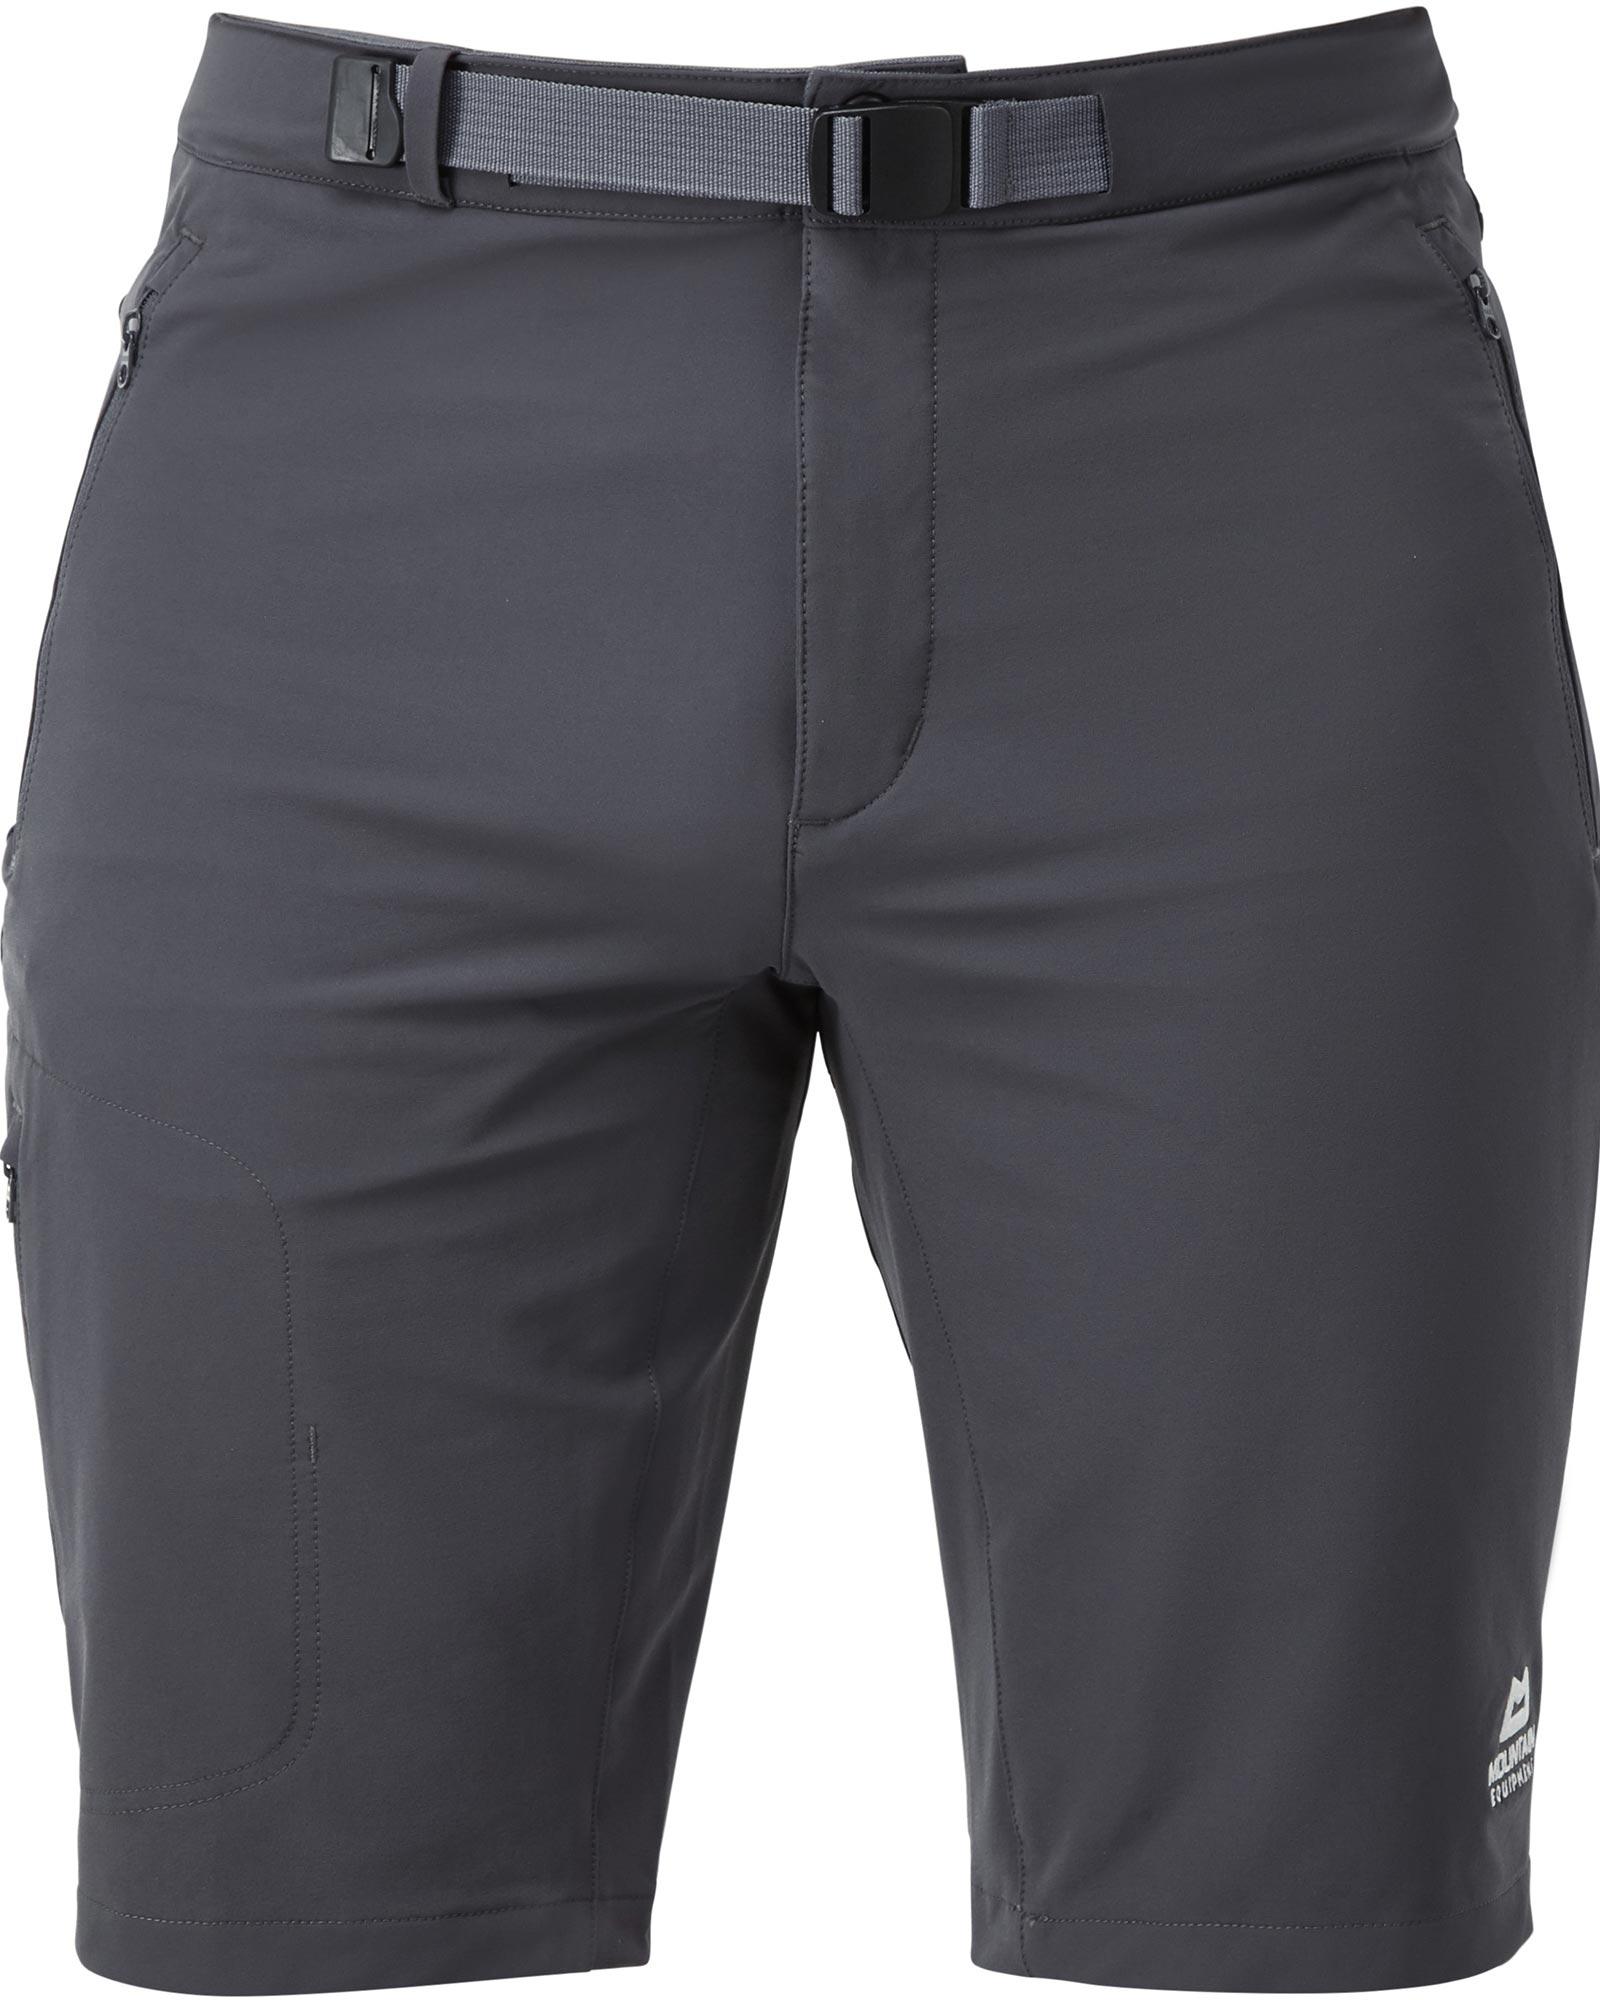 Product image of Mountain equipment Men's Ibex Mountain Shorts